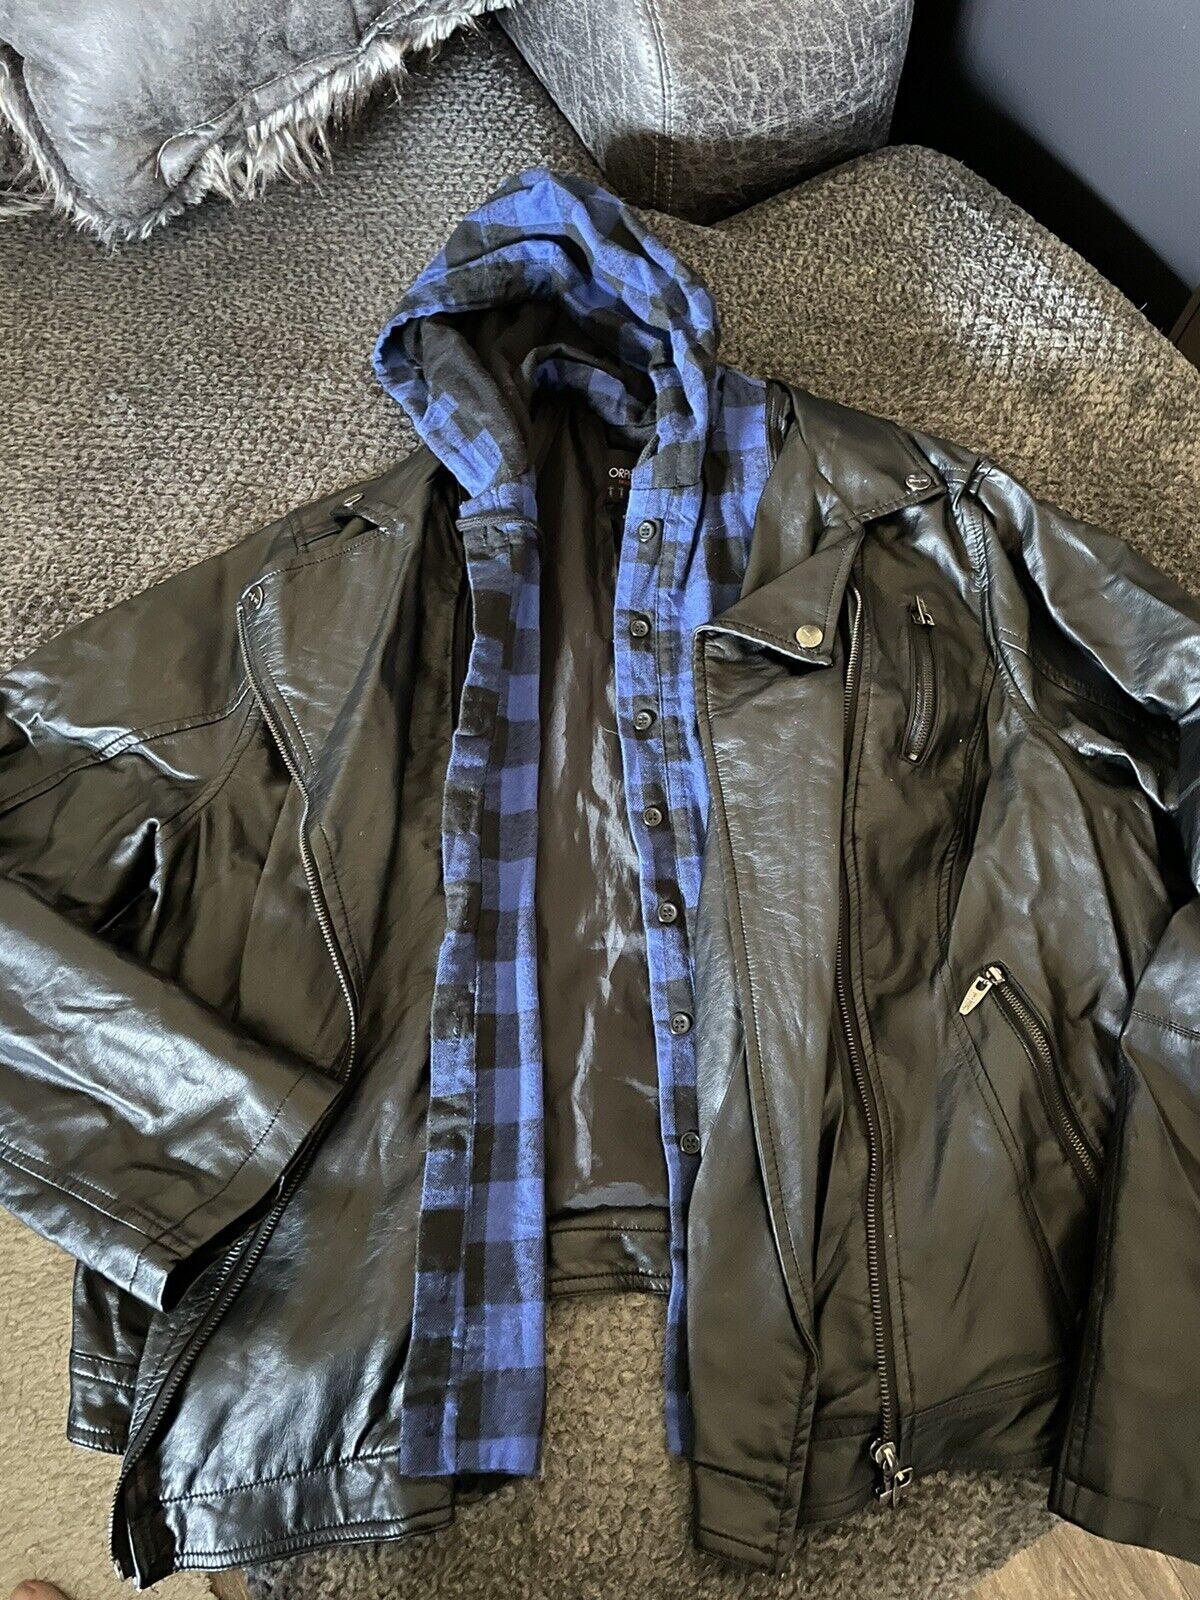 Torrid Black Biker Jacket Hooded Plaid 2 2XL 16 / 18 Punk Goth Emo Plus Sized